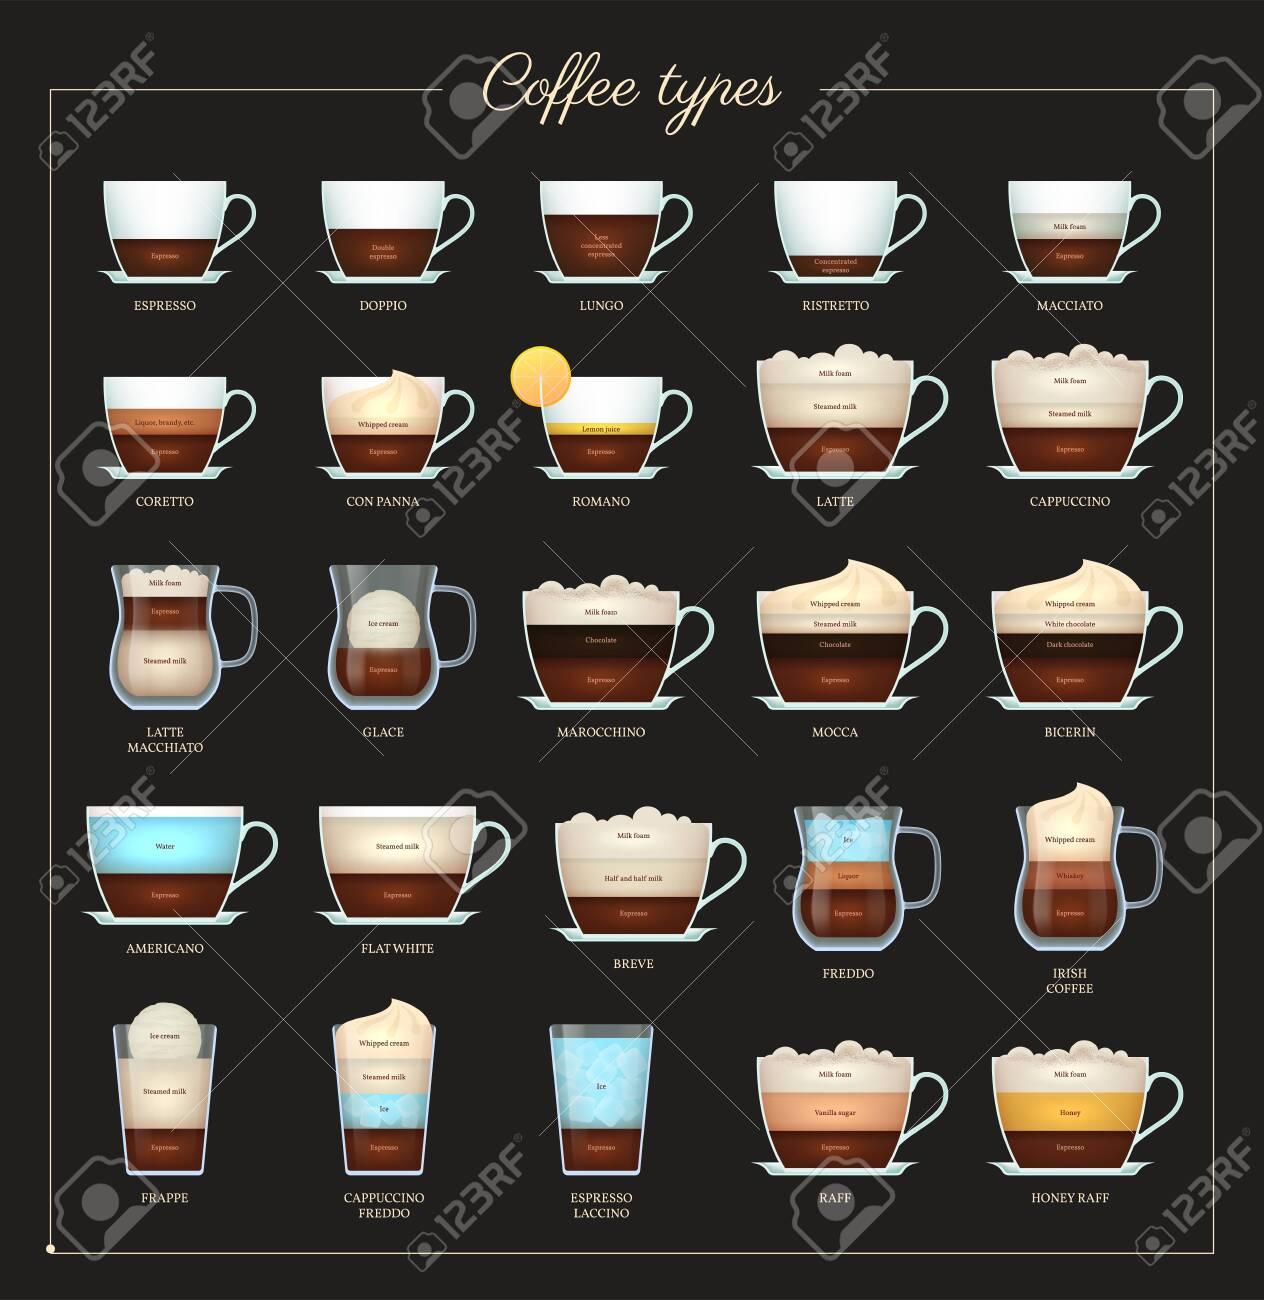 Coffee recipe flat set. Assortment of coffee drinks. Aroma hot tasty drinks preparation guide. Coffee menu design for cafe, bar, shop or restaurant design vector illustration. - 153863505